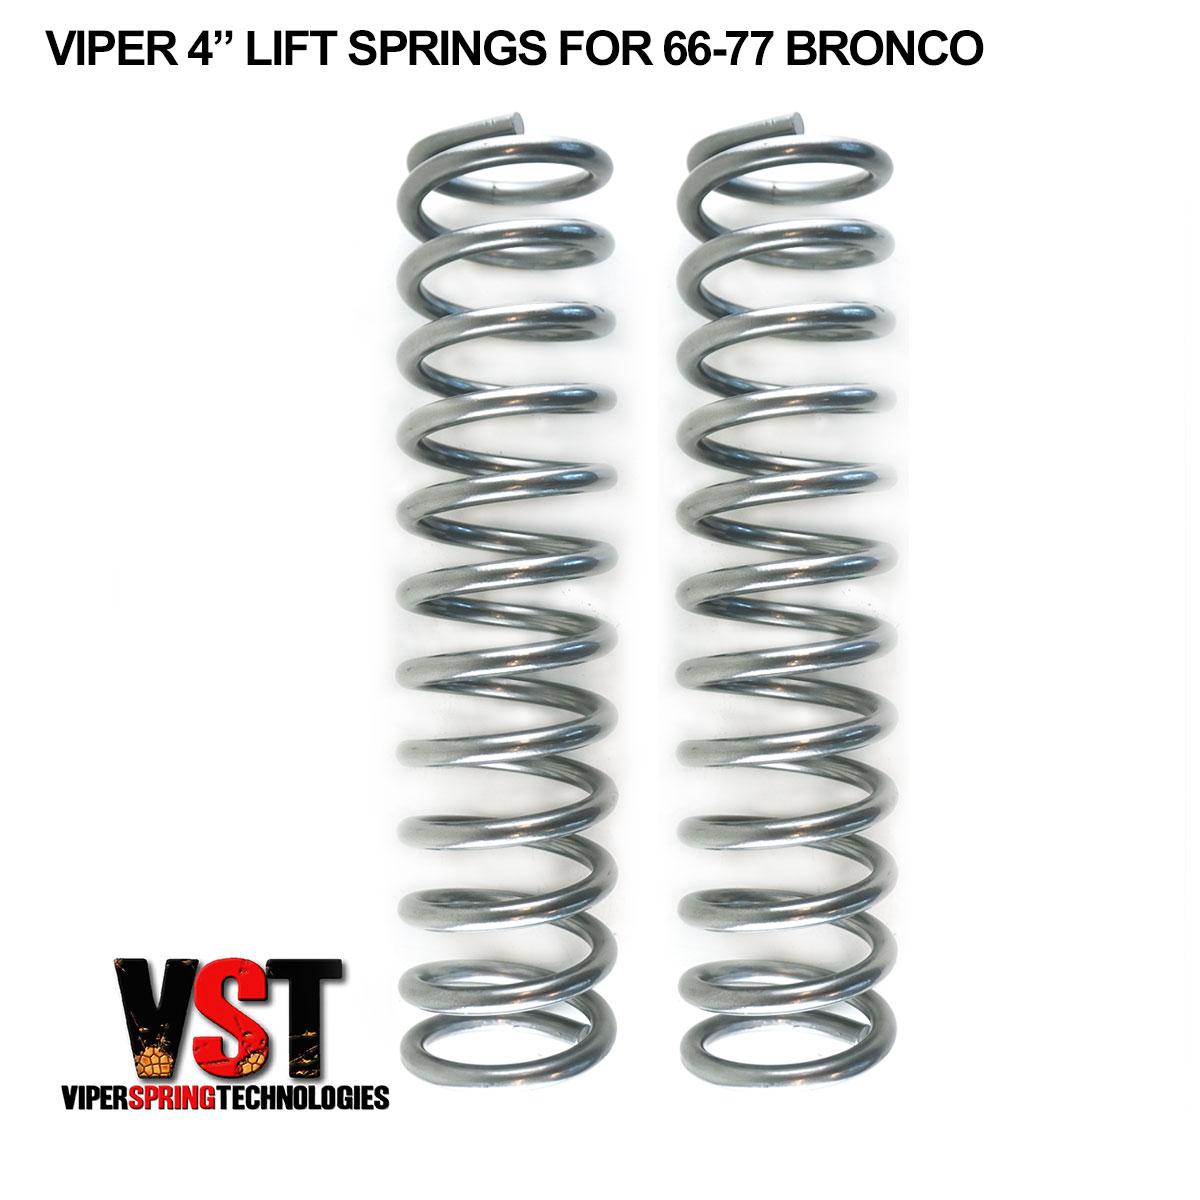 Viper 4 Lift Springs For 66 77 Bronco